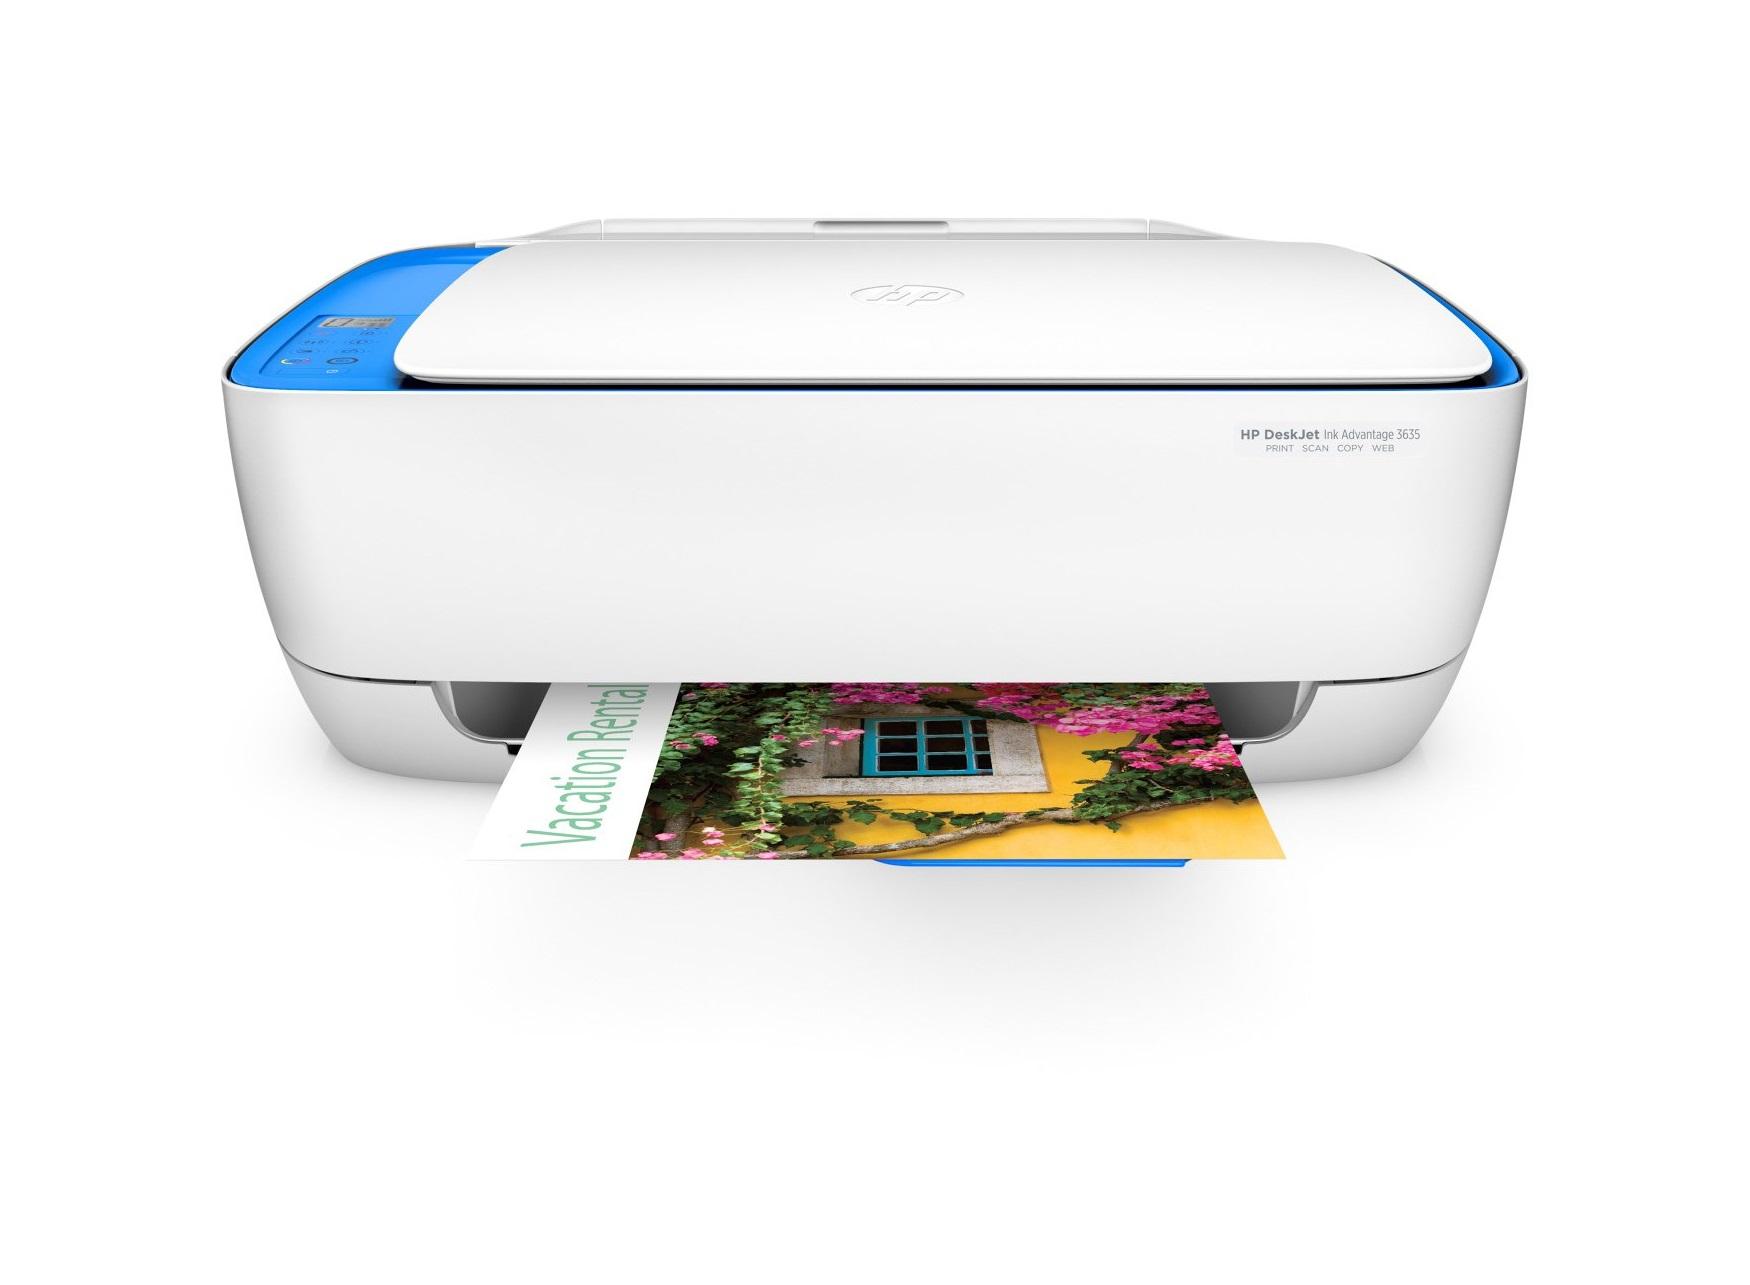 HP Deskjet 3635, analizamos esta impresora todo en uno